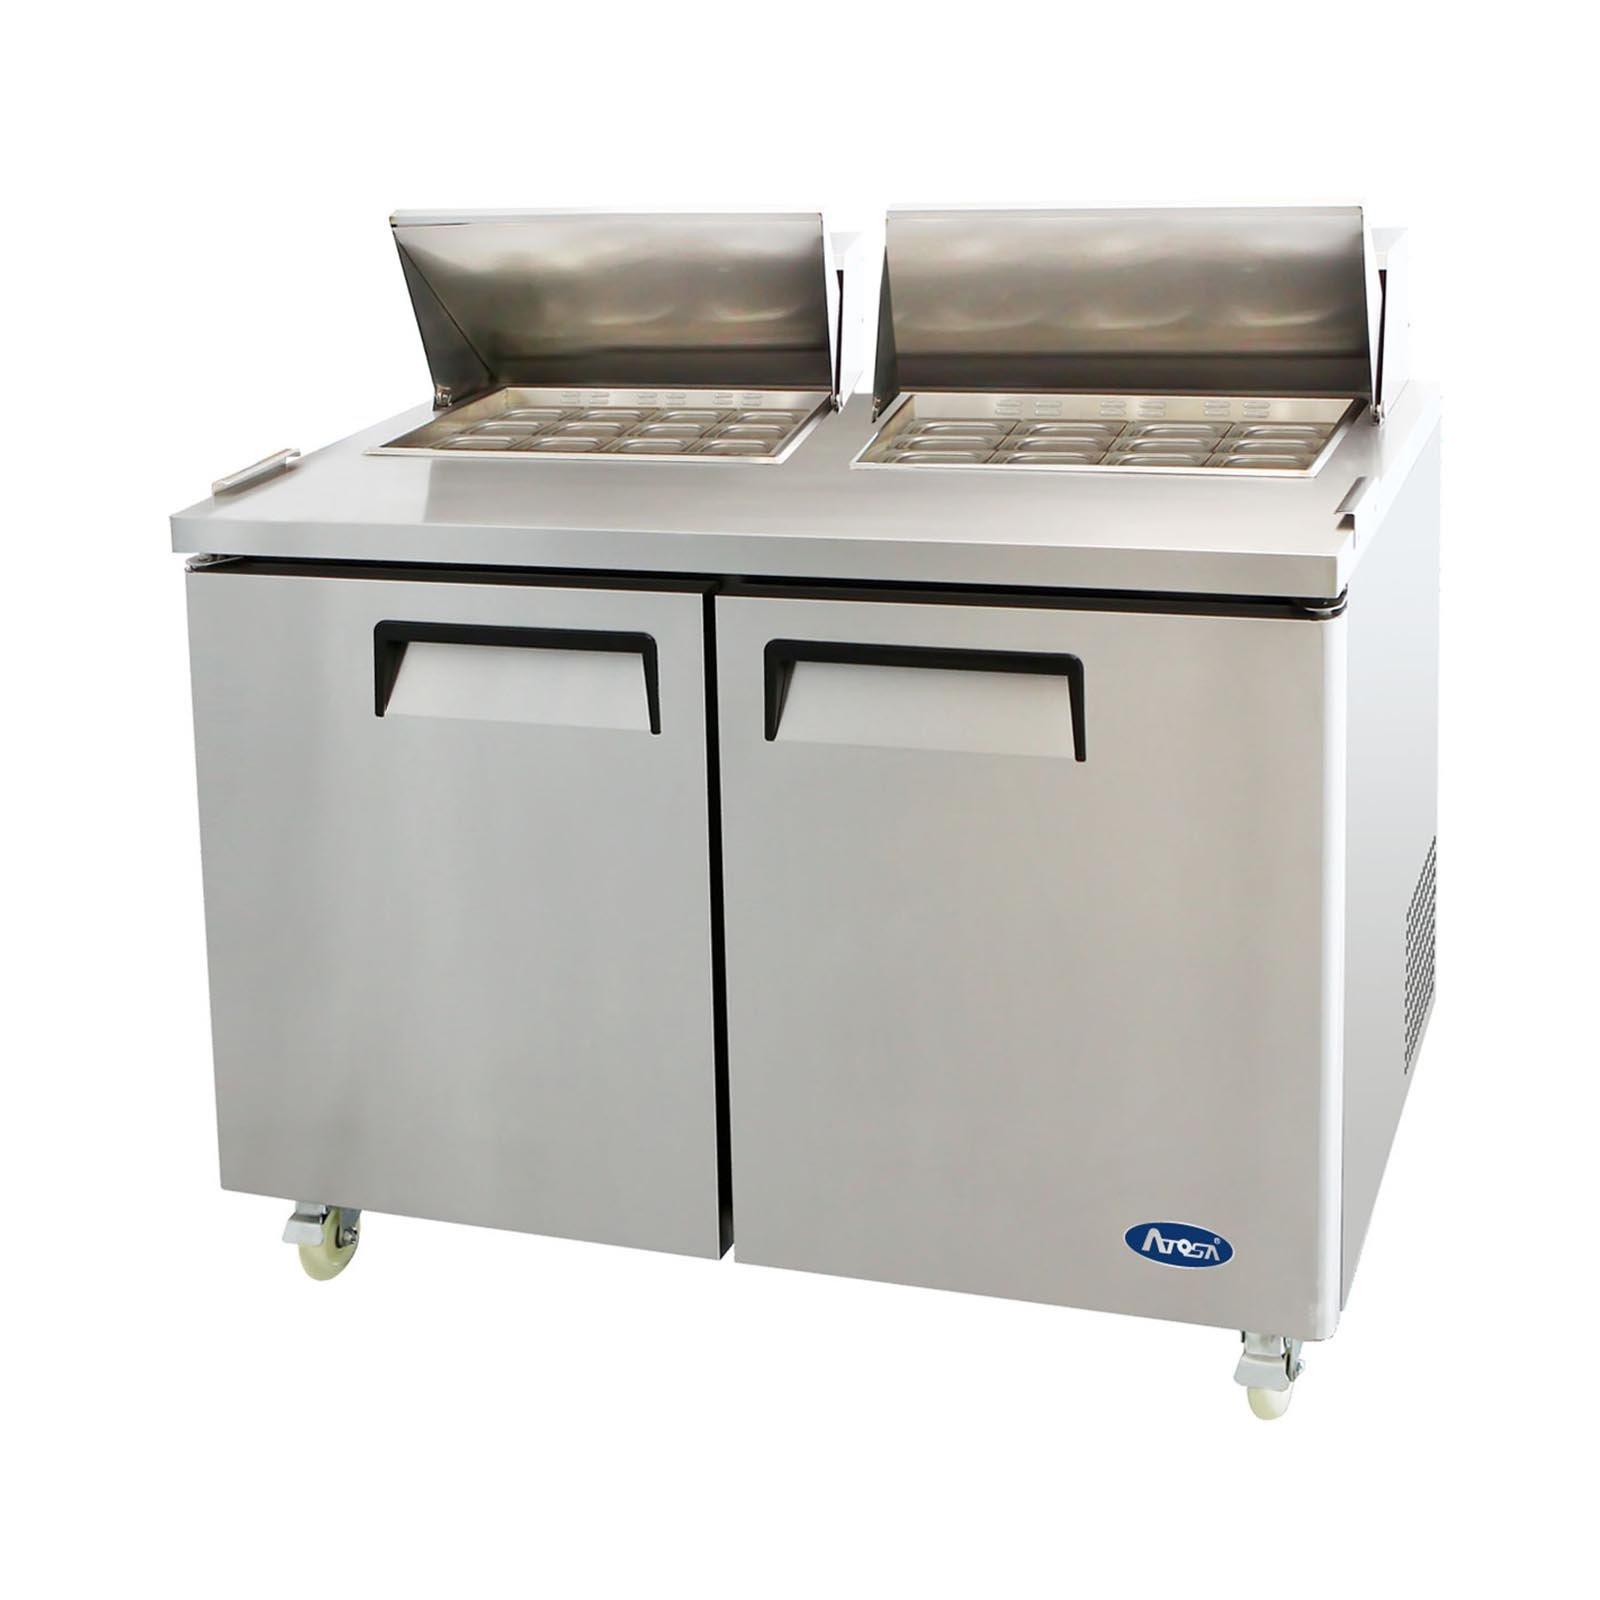 Atosa MSF8307 Stainless Steel Mega Top Sandwich Prep Table 60'' 2-Door Fridge